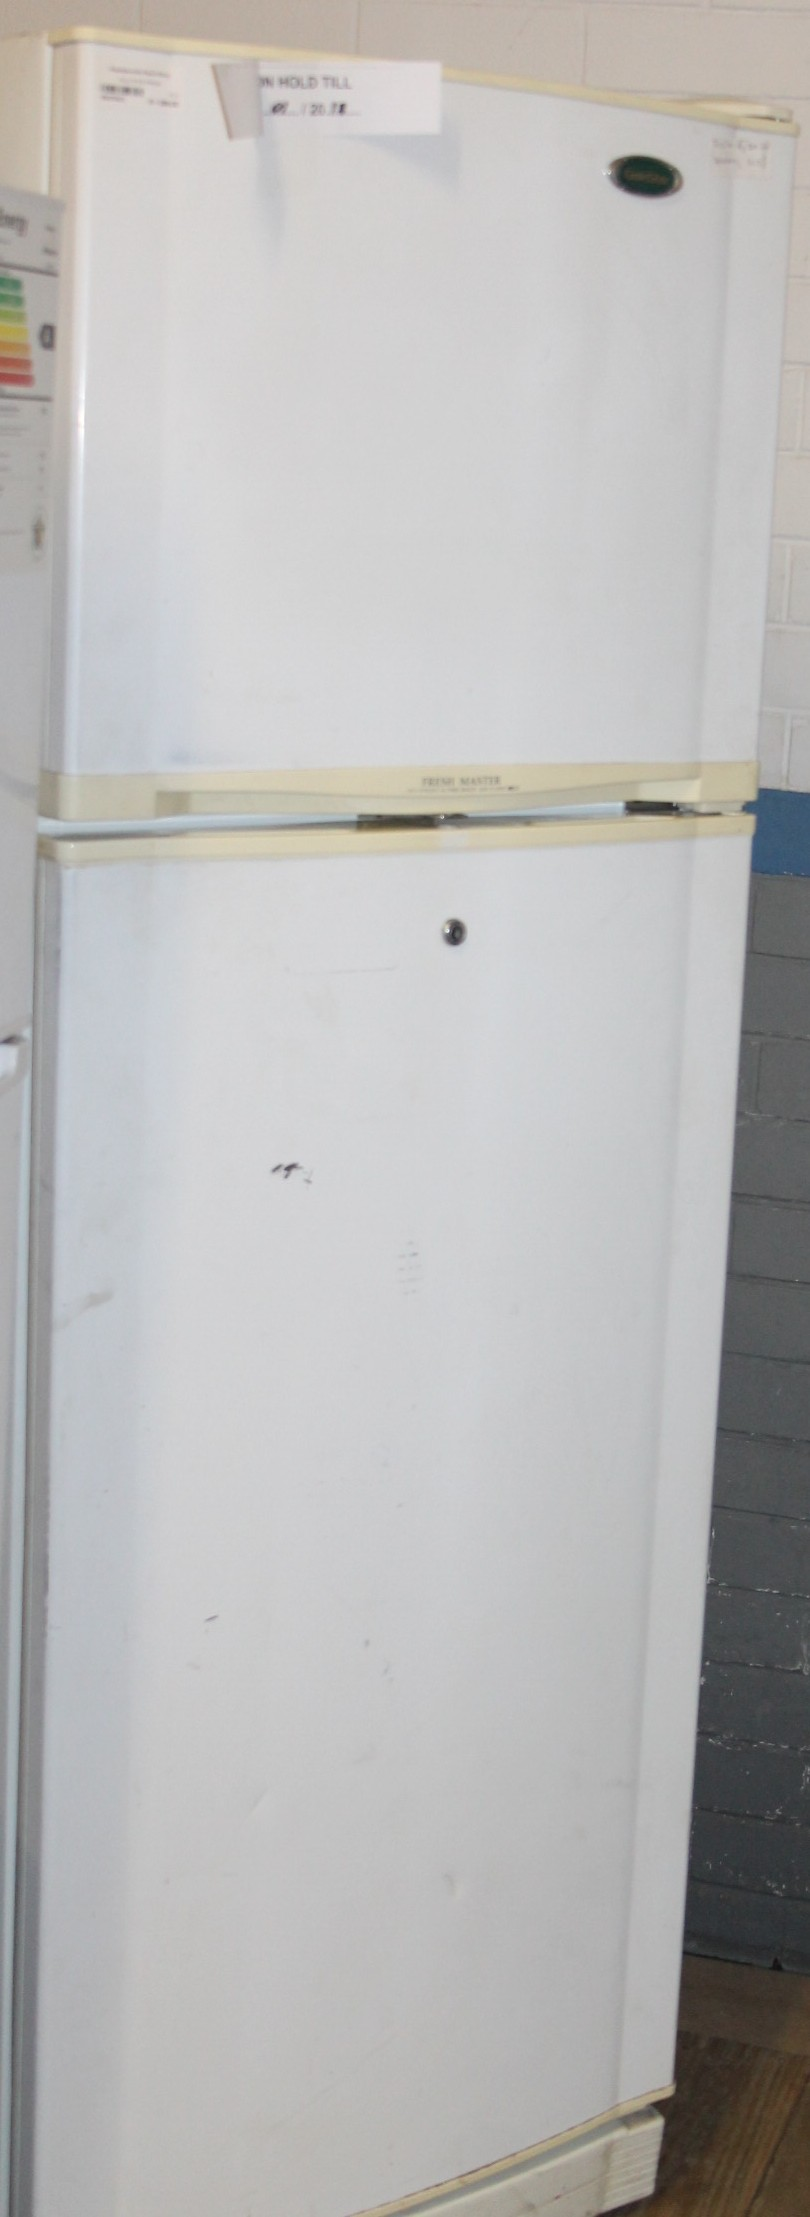 Gold star fridge S027843c #Rosettenvillepawnshop